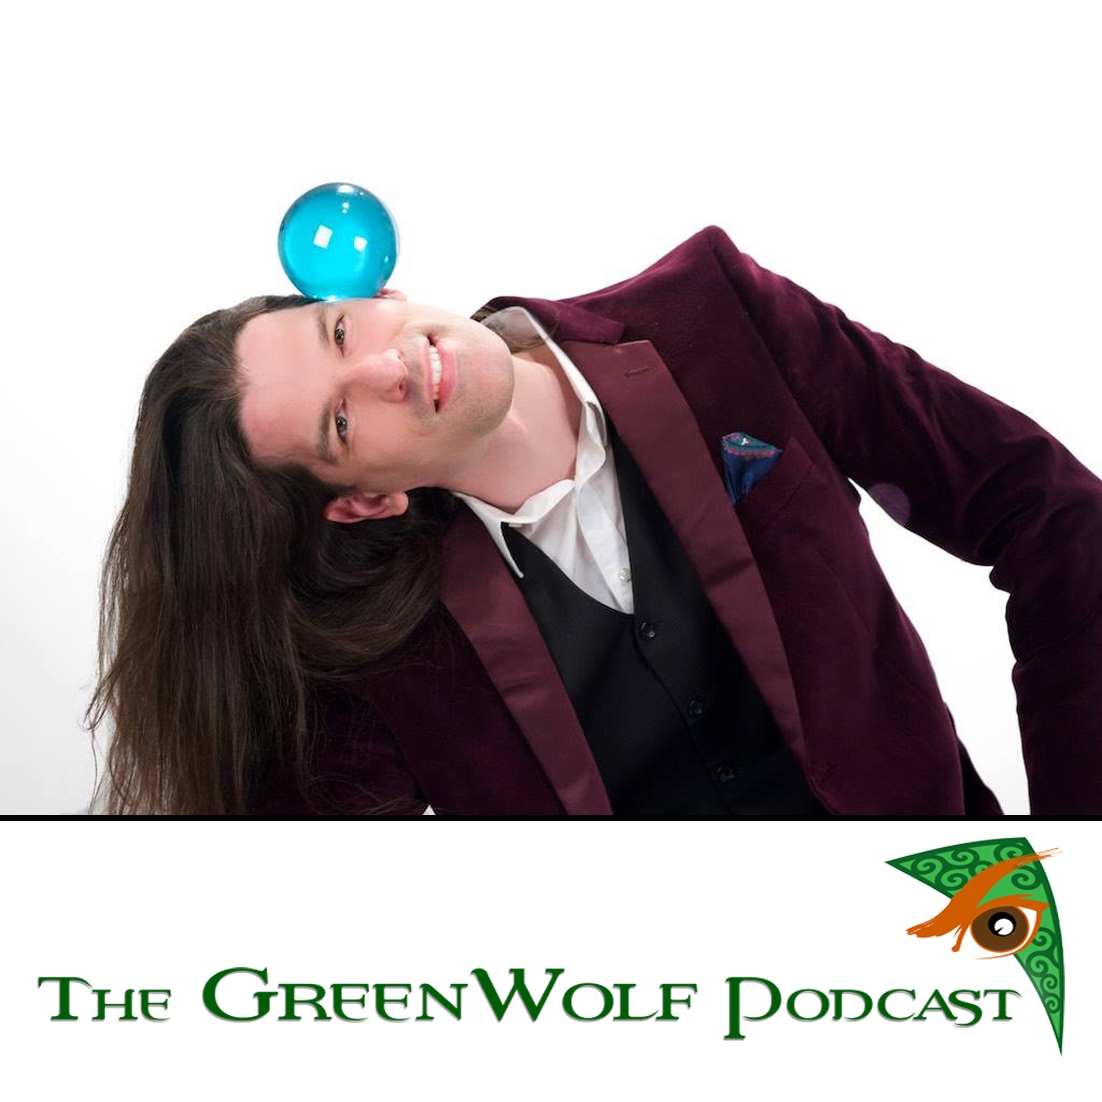 The GreenWolf Podcast - 004- The One Man Sideshow David Darwin